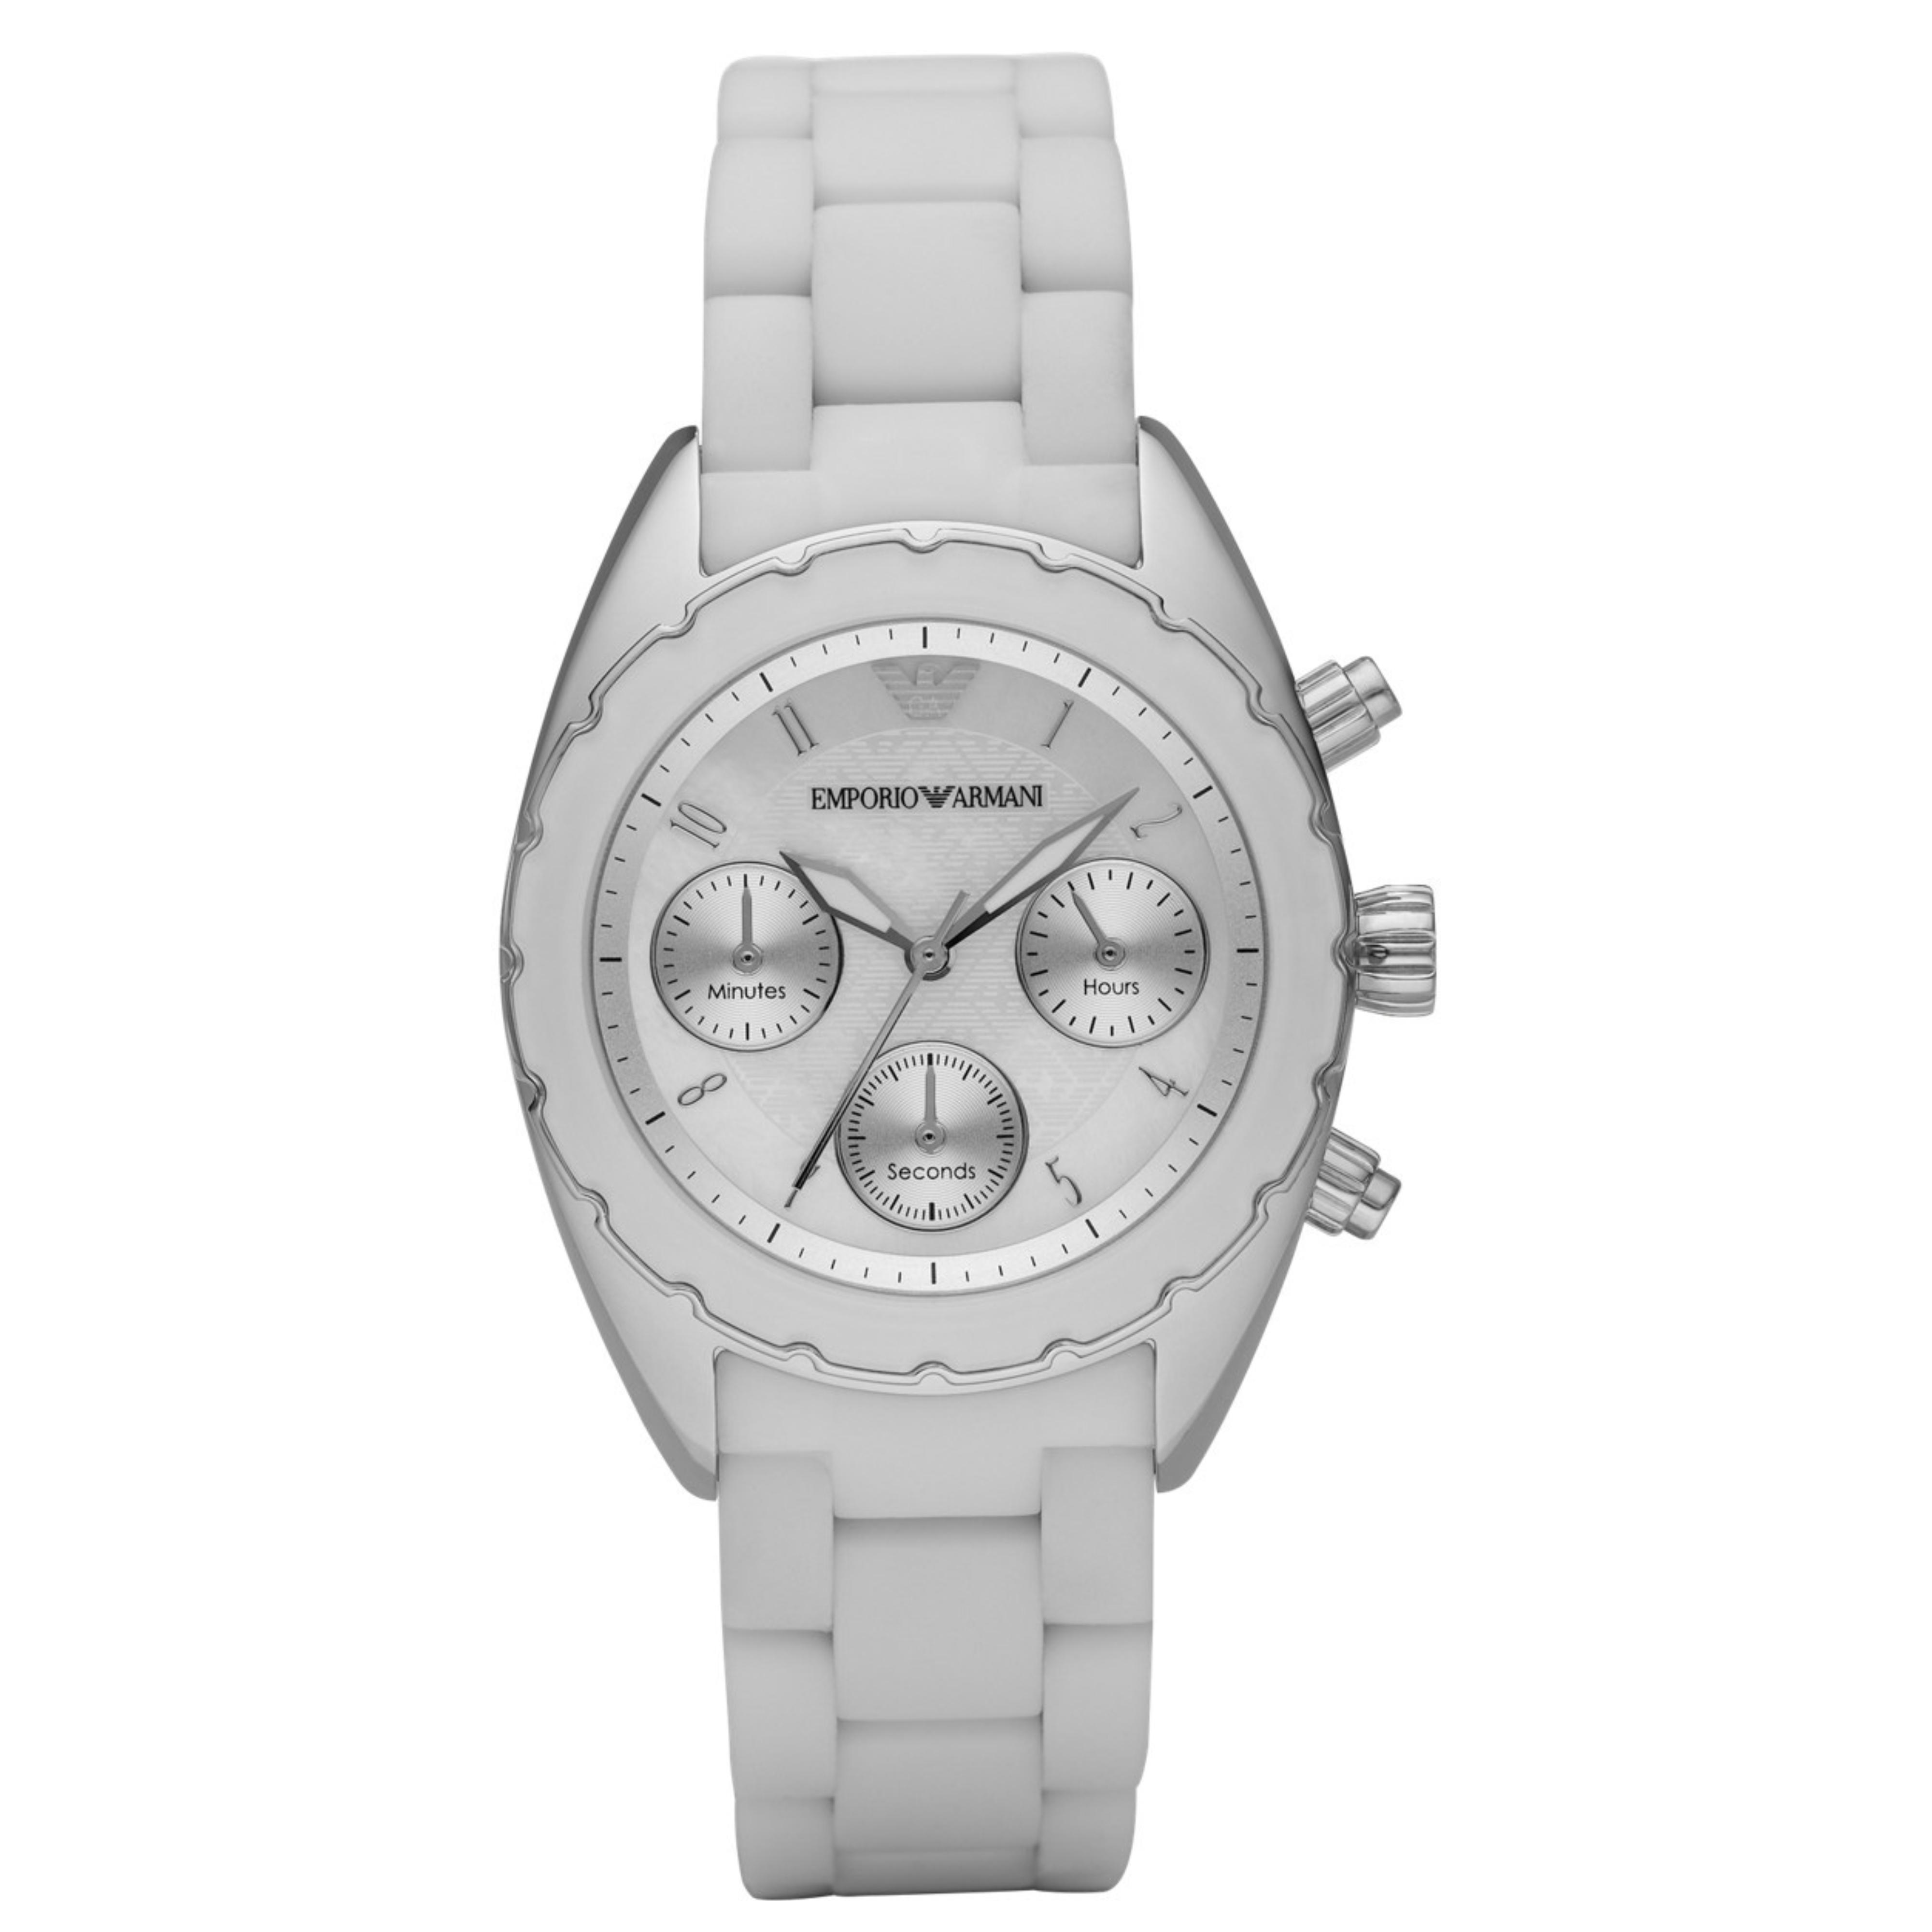 1486a24393e0 Emporio Armani Deportivo Reloj Mujer Ar5941 │ Blanco Cronómetro ...